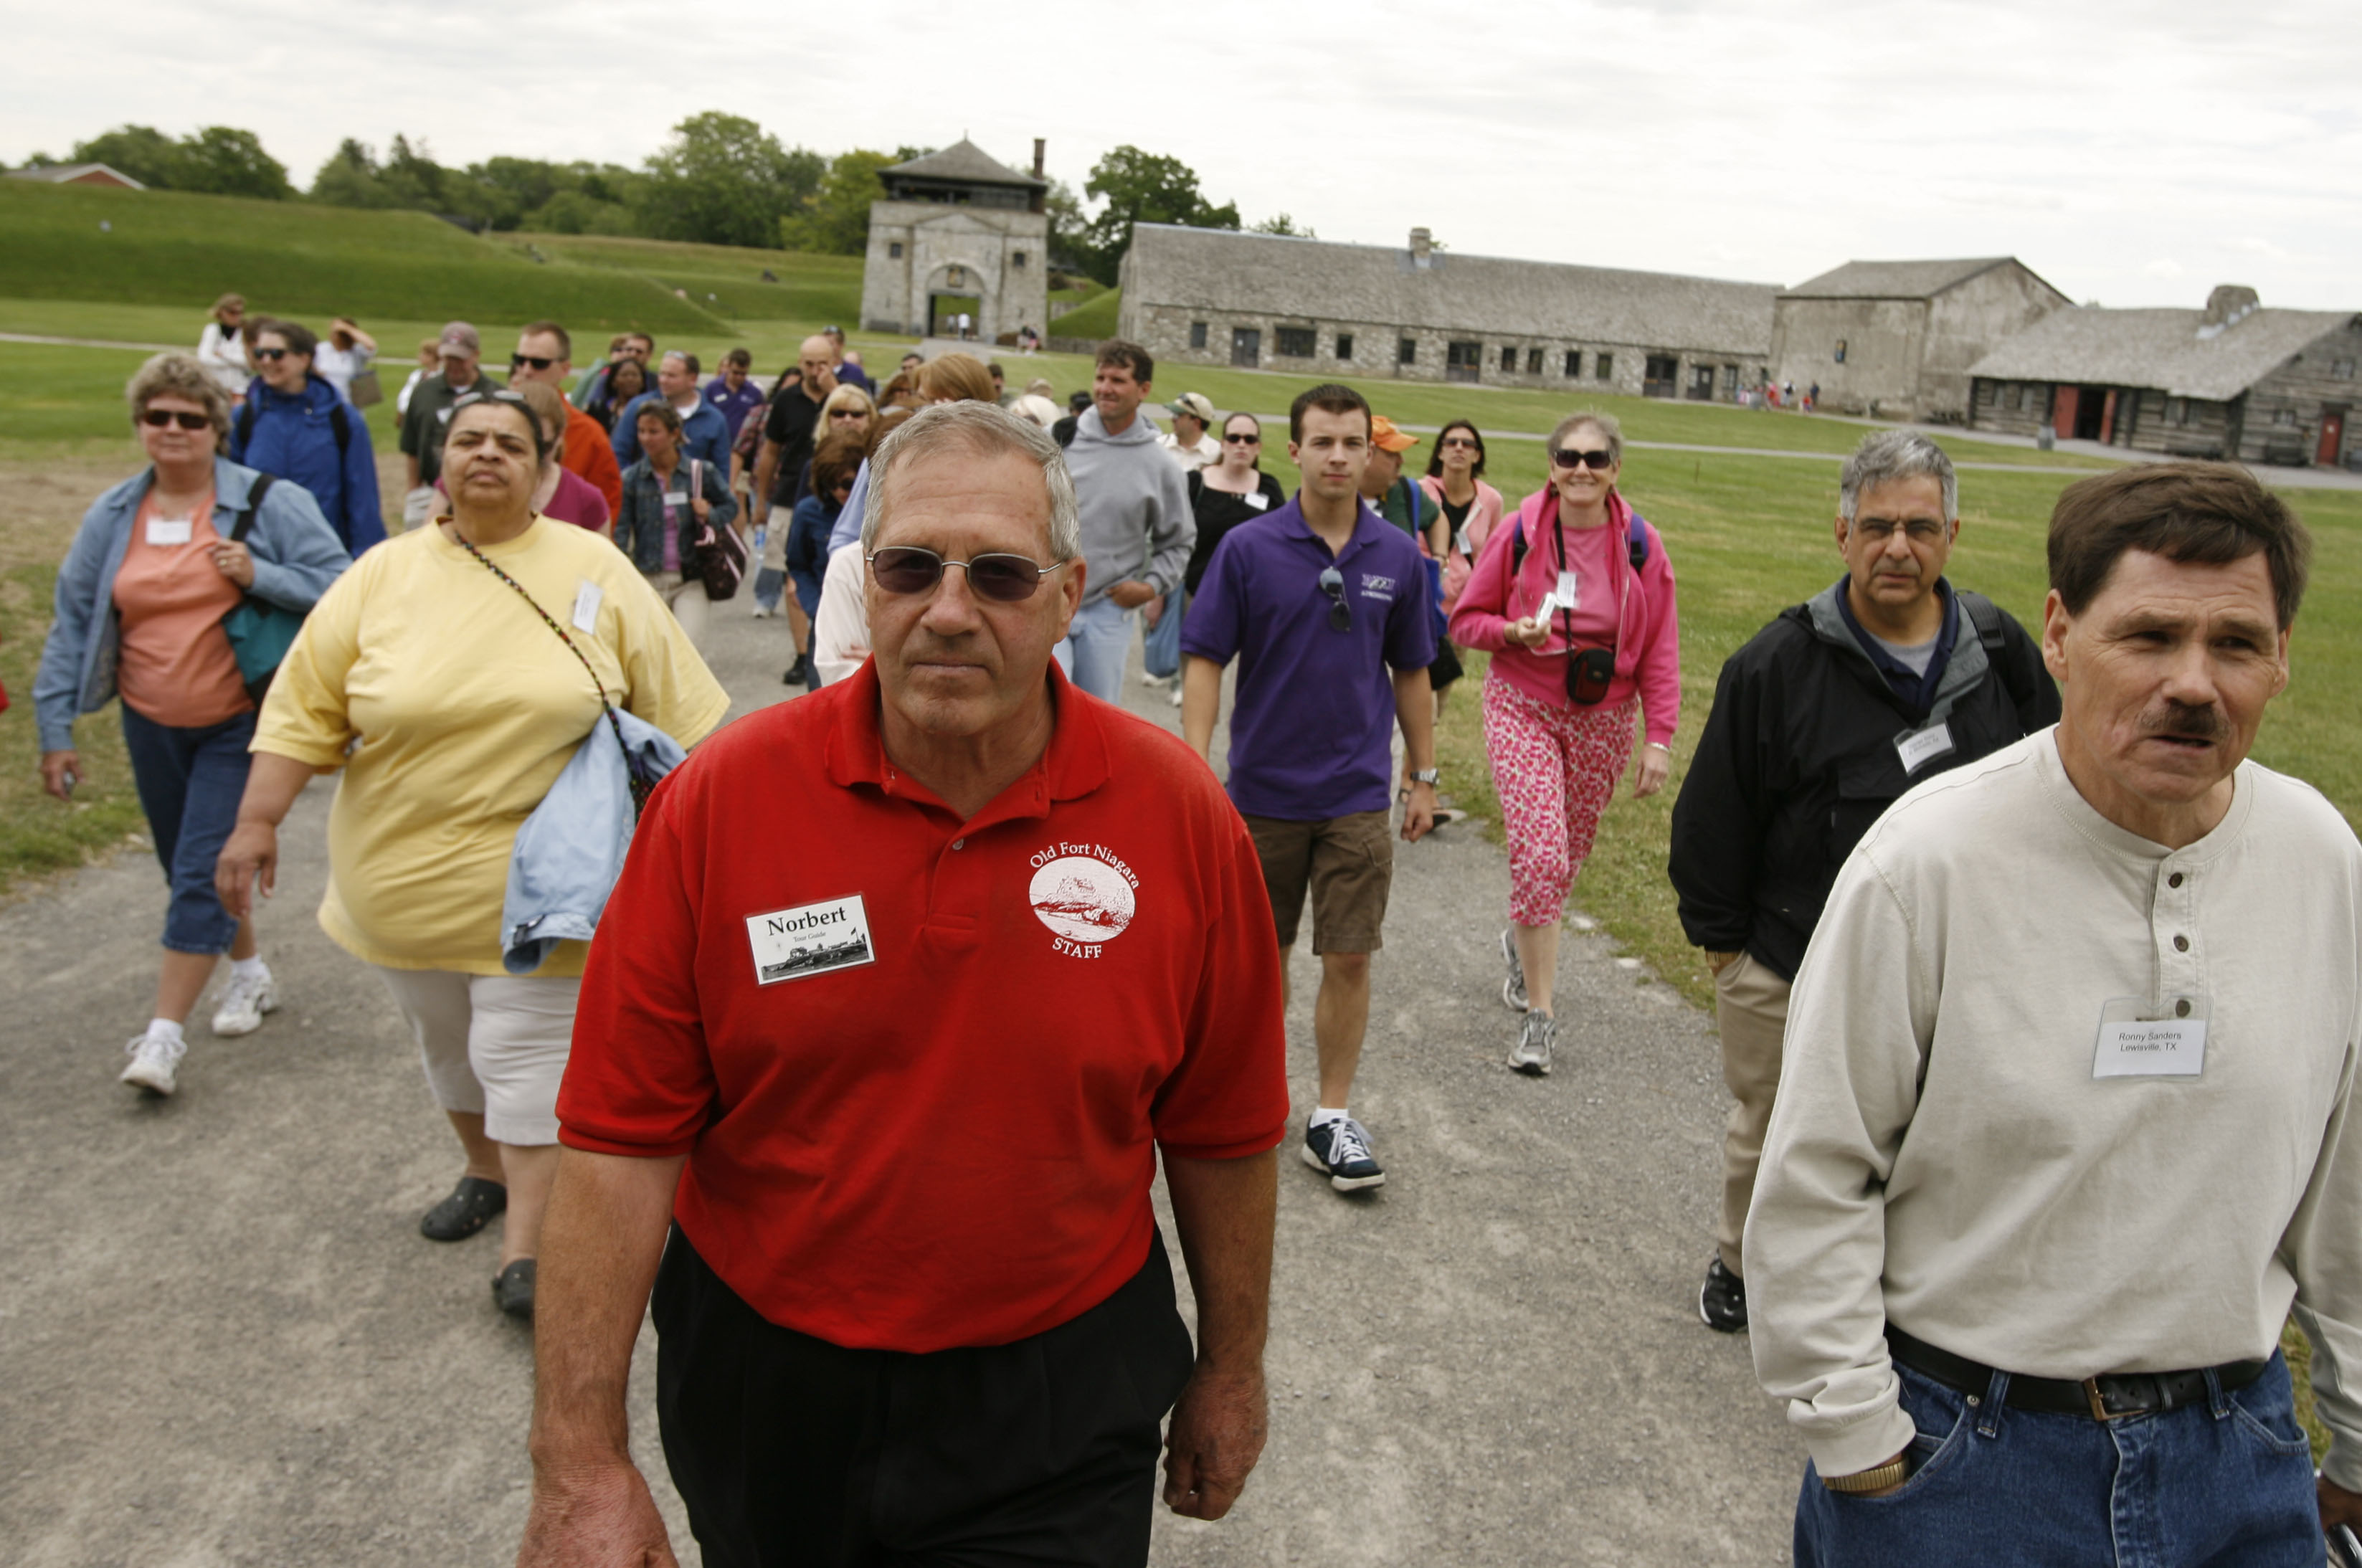 Despite warnings, past Buffalo bishops returned abusive clergy to parishes